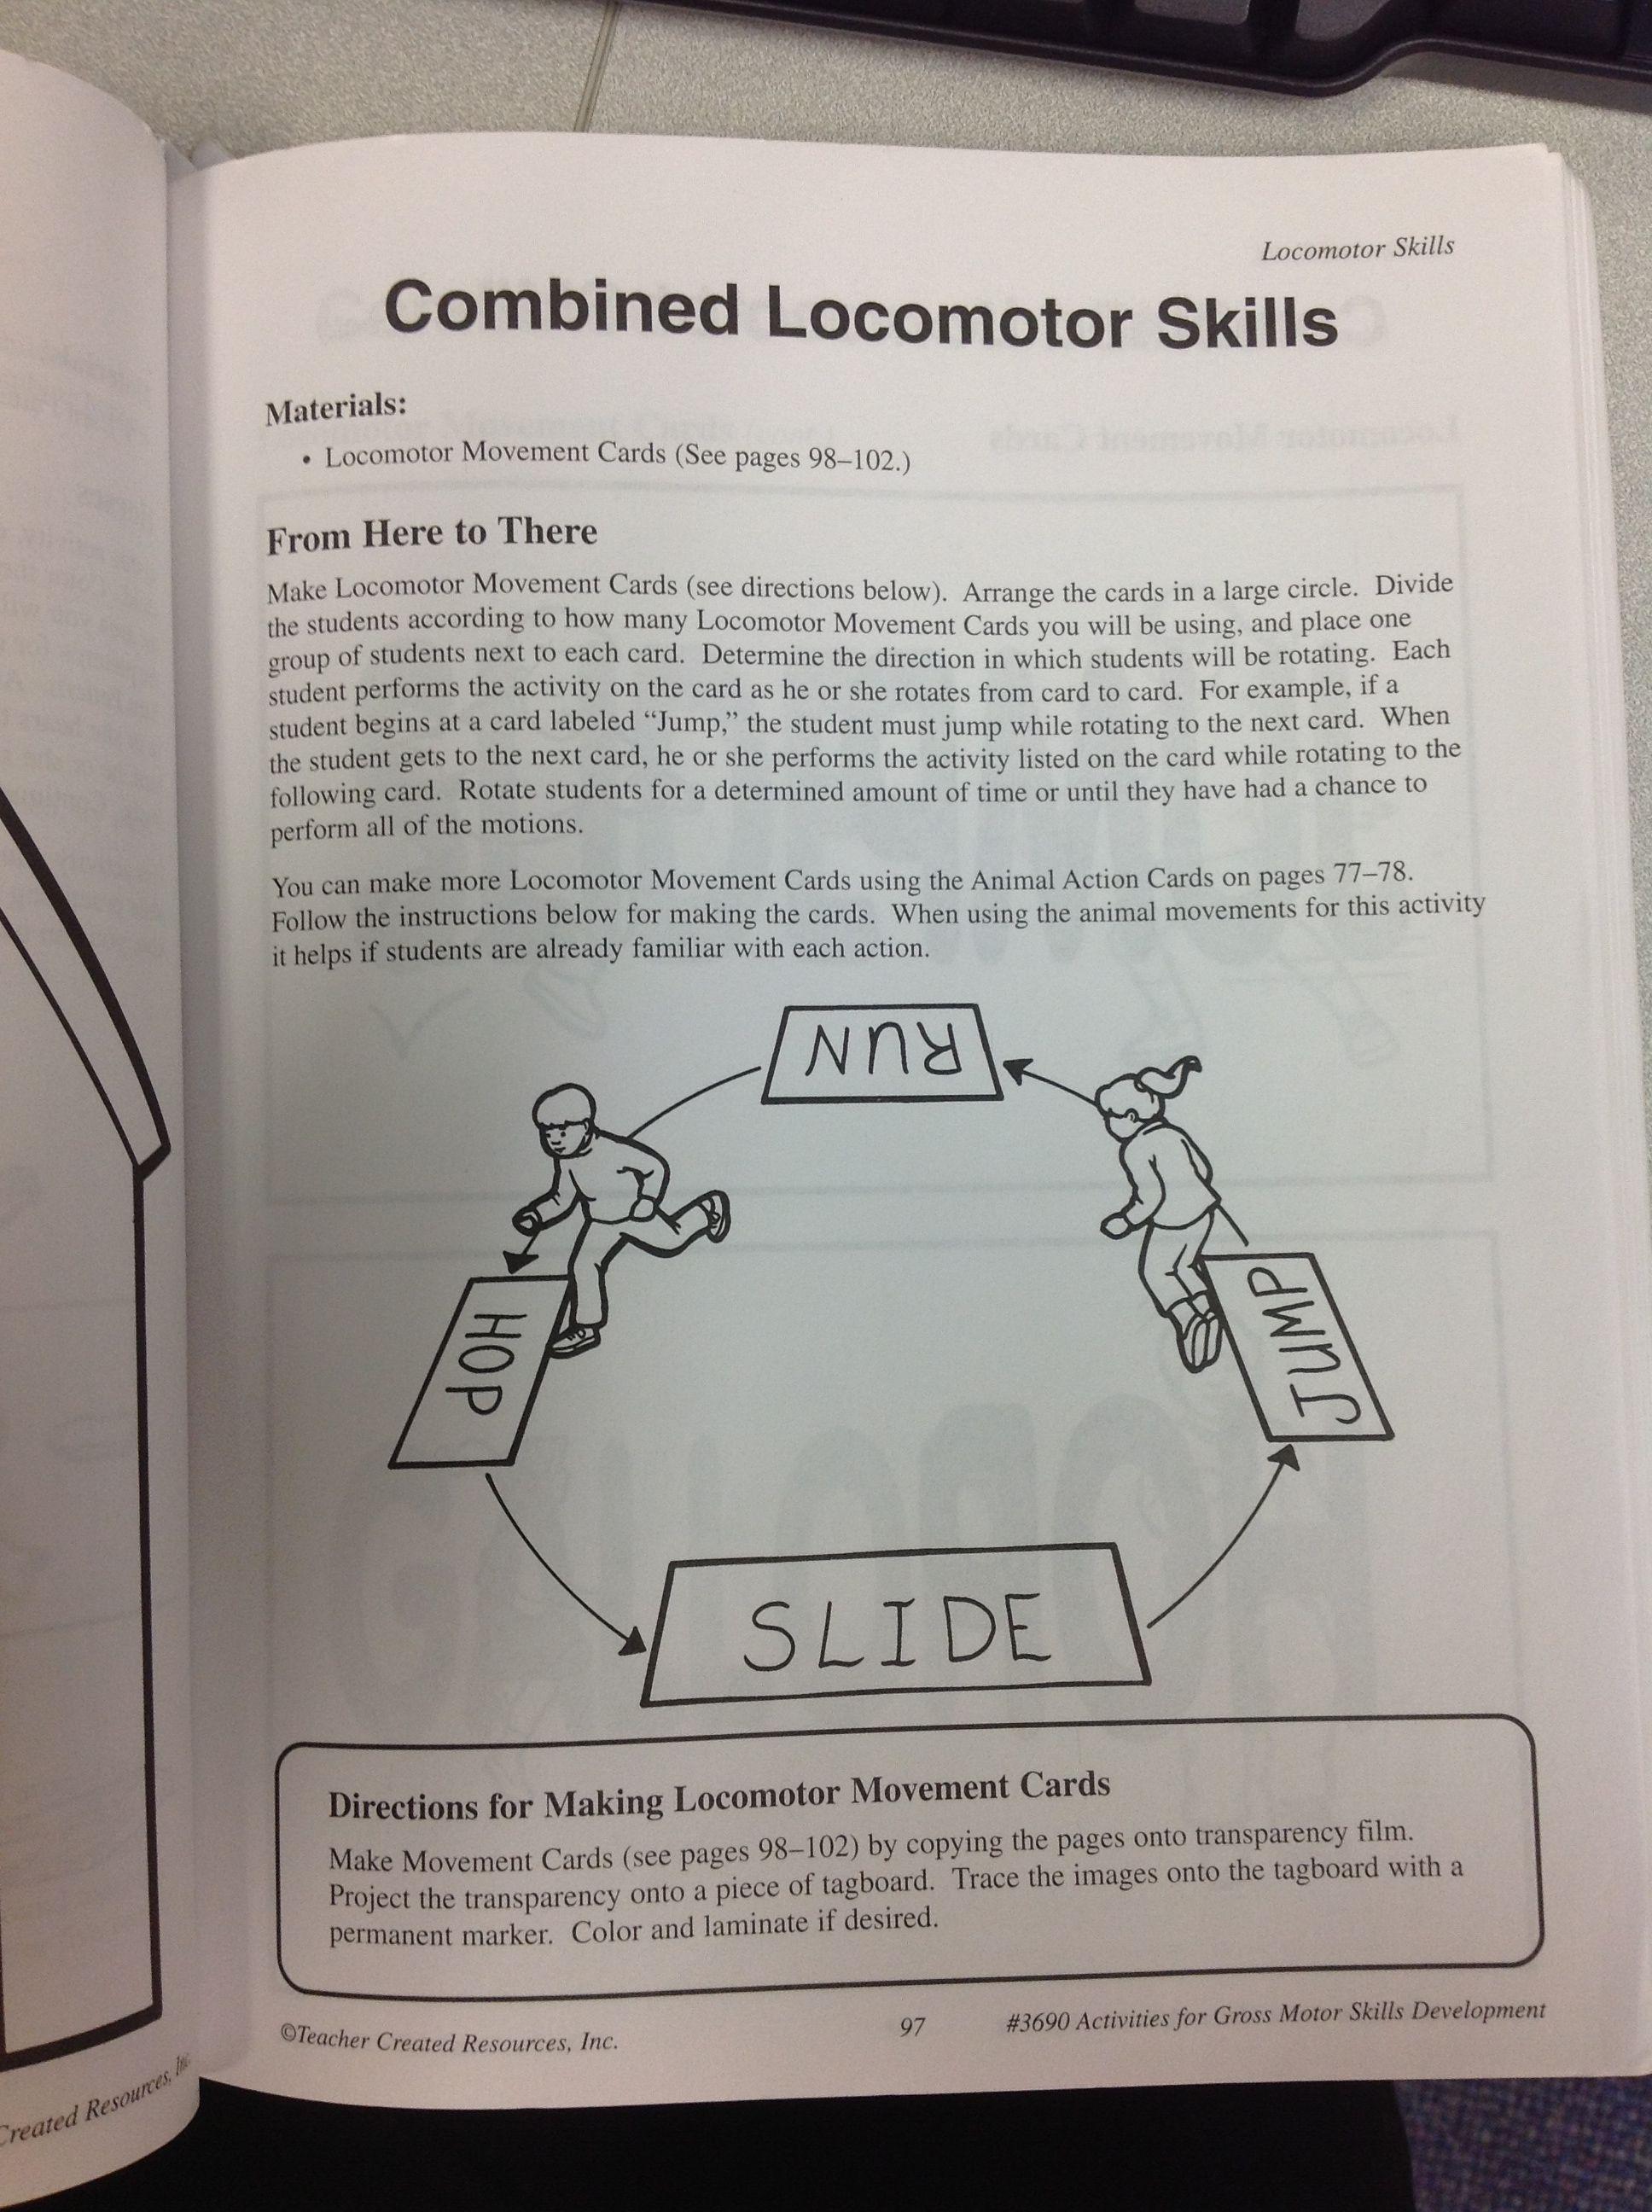 Combined locomotor skills